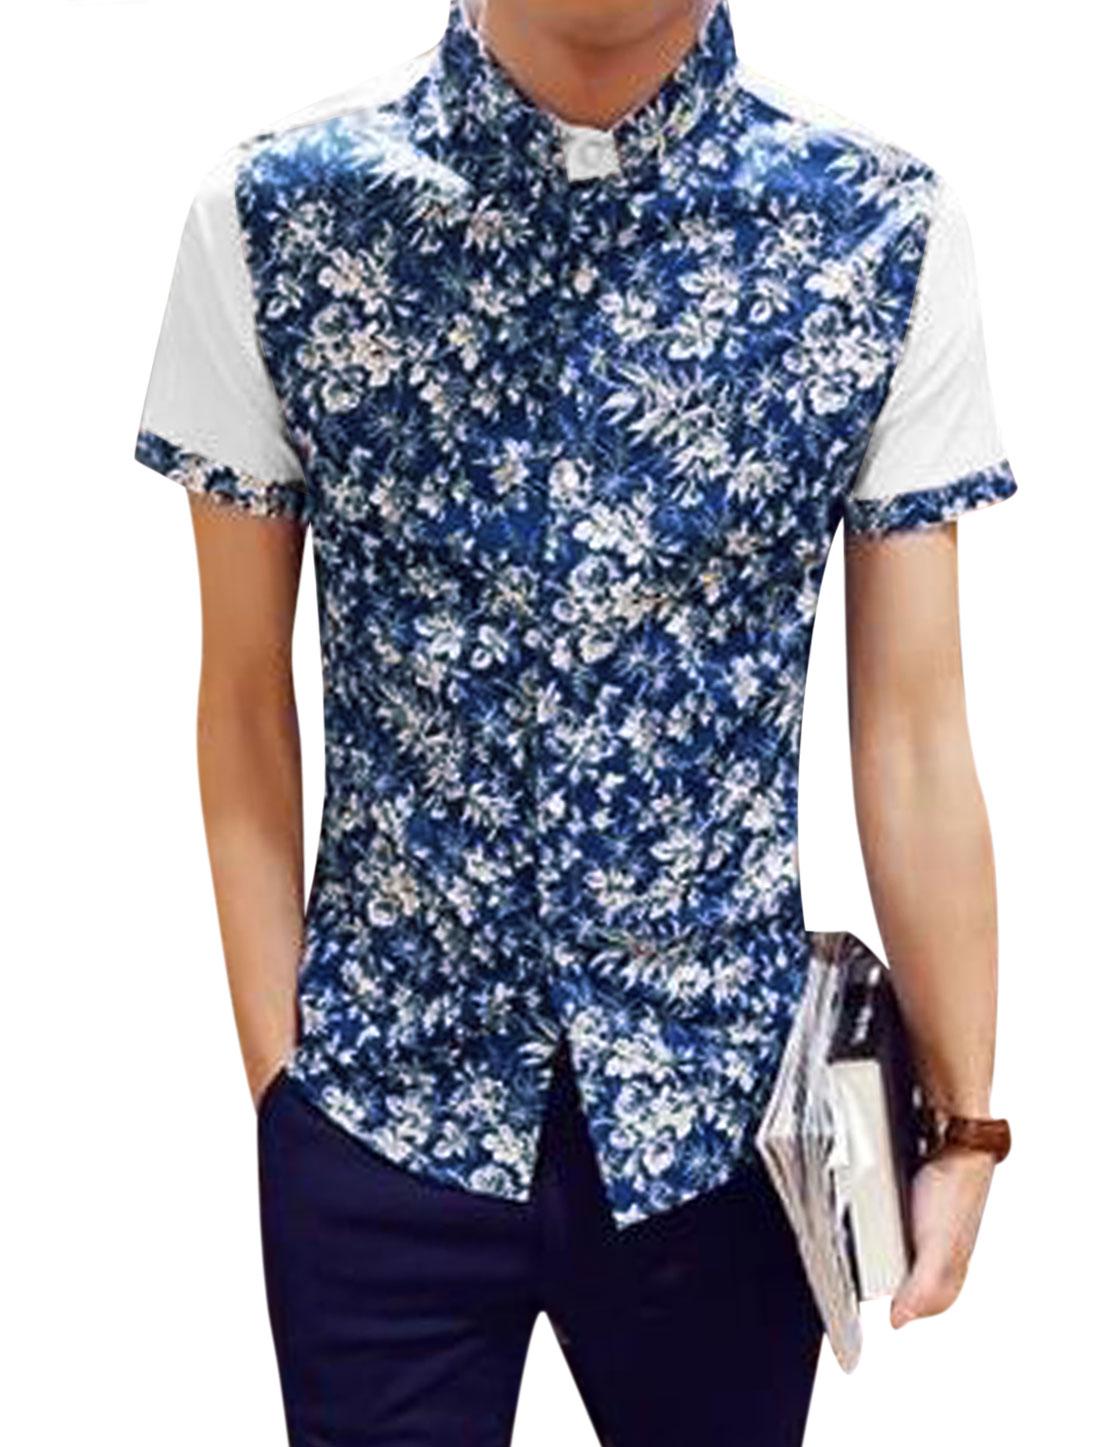 Men Short Sleeve Floral Pattern Summer Button Down Shirts Navy Blue S